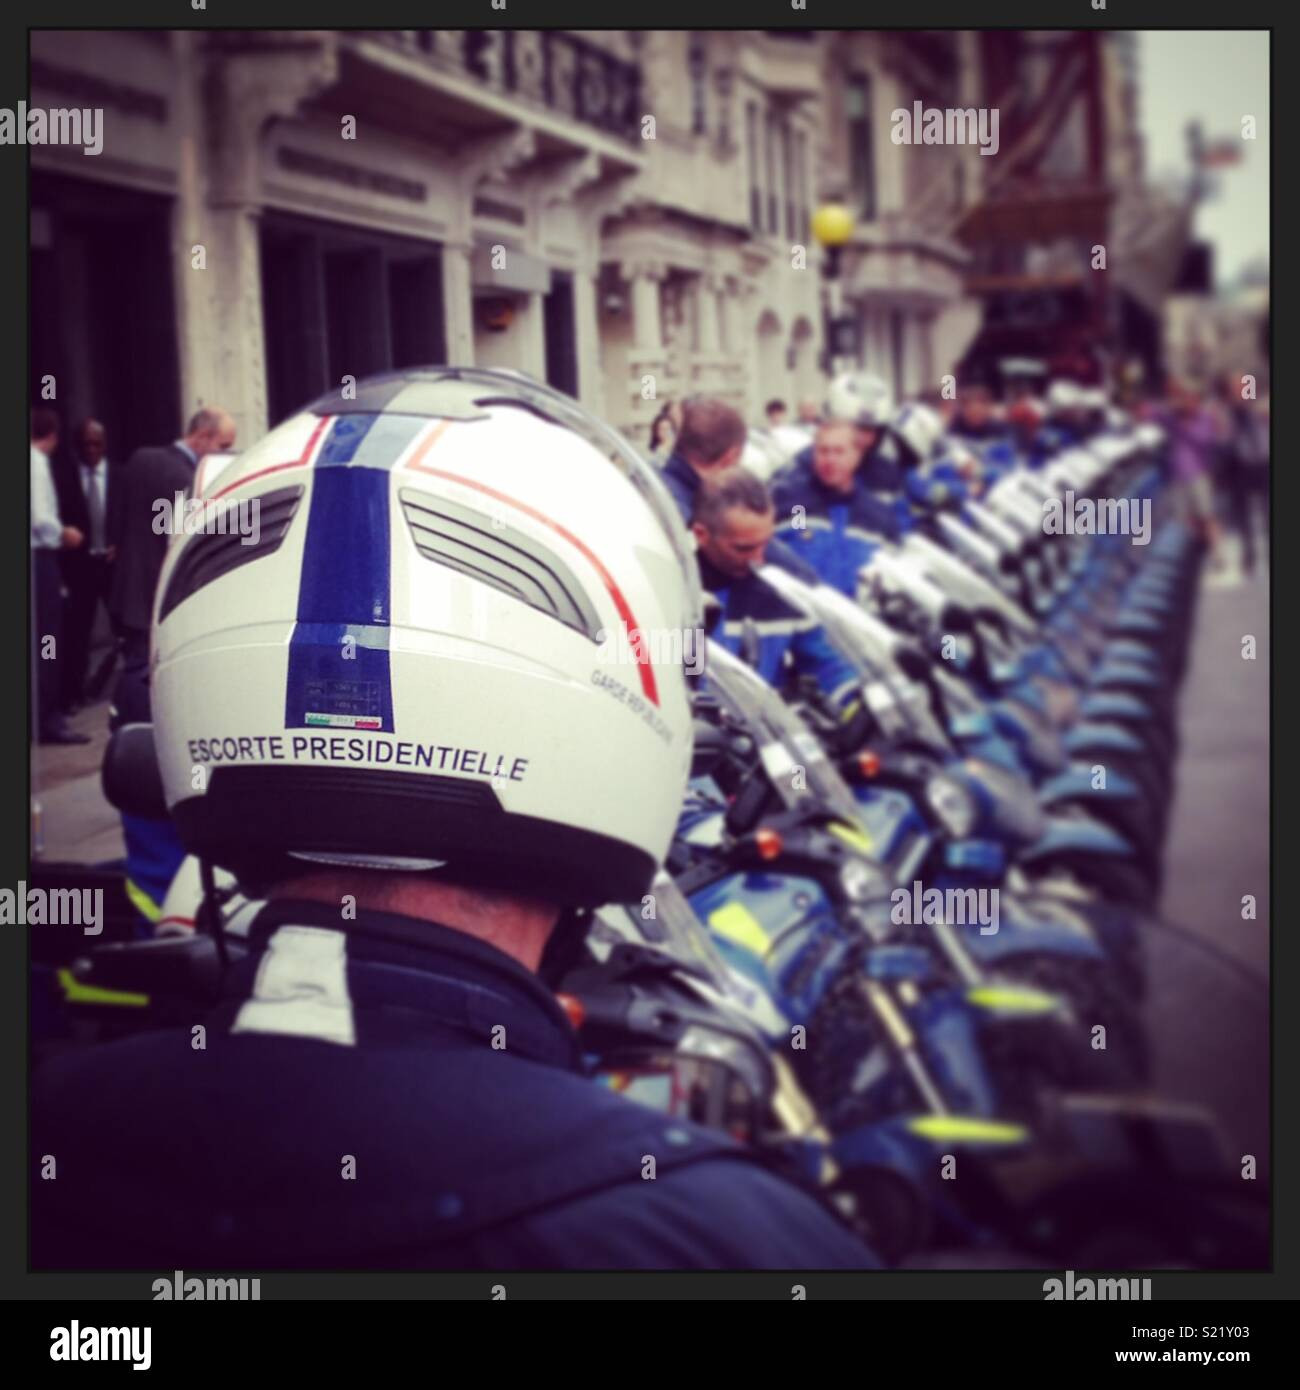 Gendarmerie - Stock Image